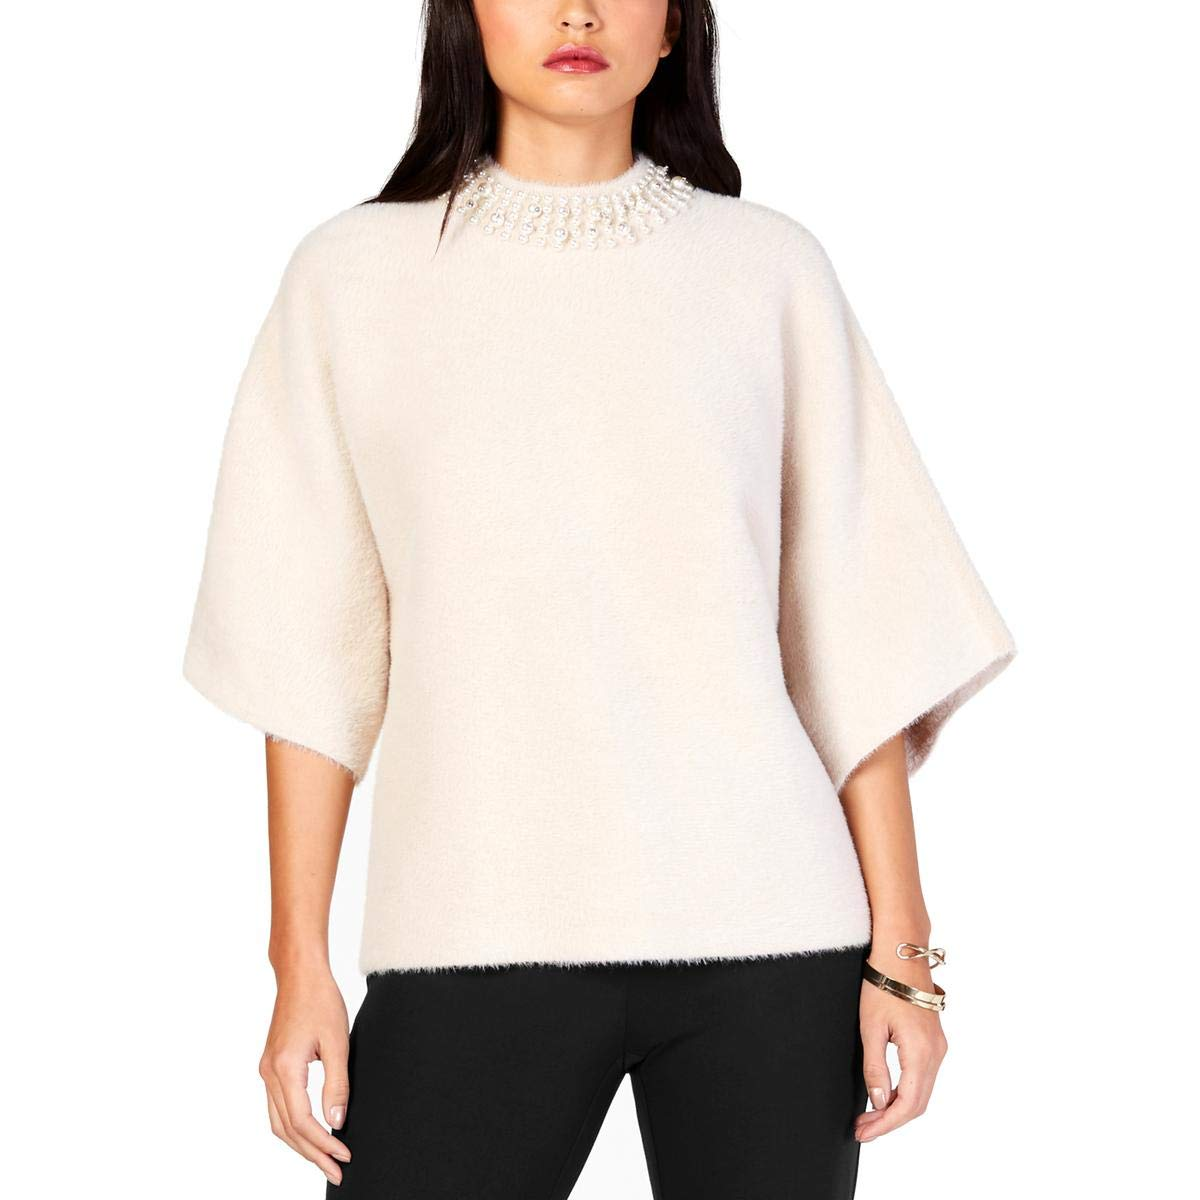 Alfani Womens Faux Fur Embellished Mock Turtleneck Sweater